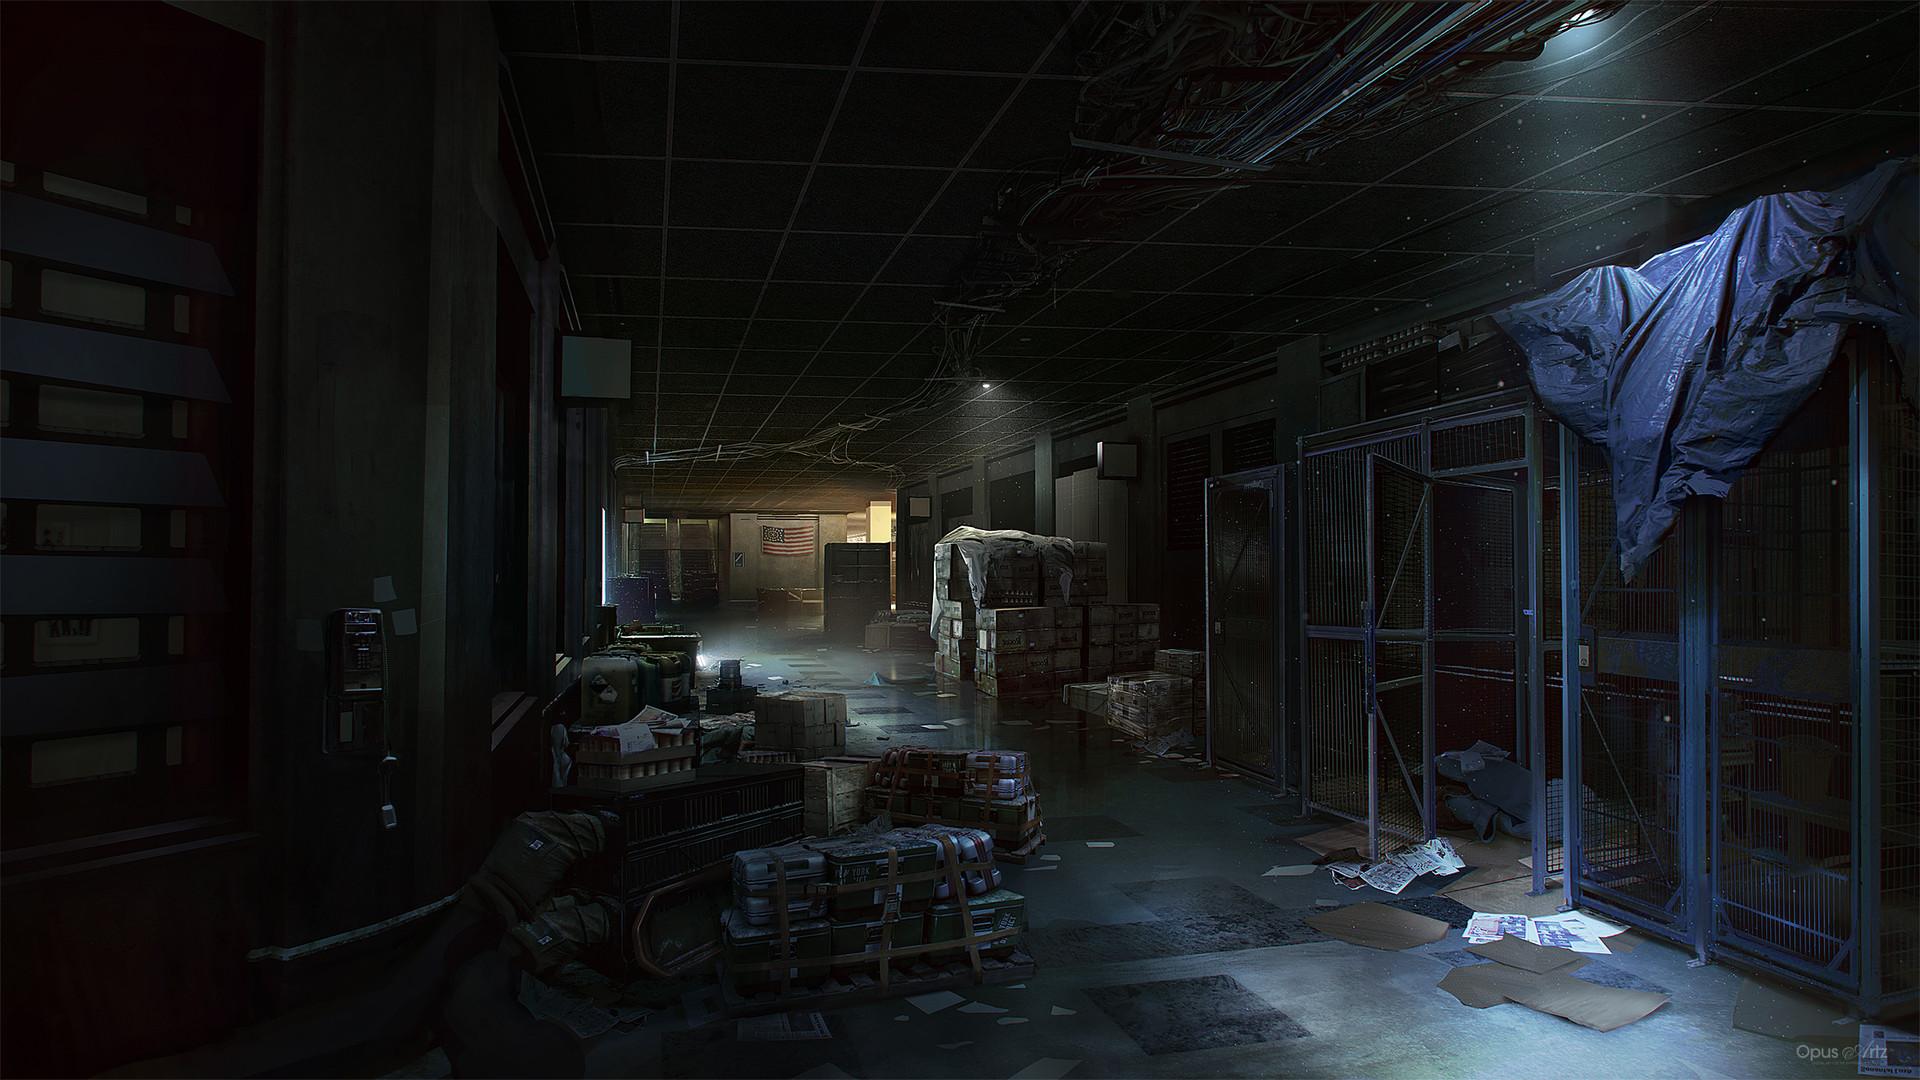 Opus artz rockafeller prison final 01